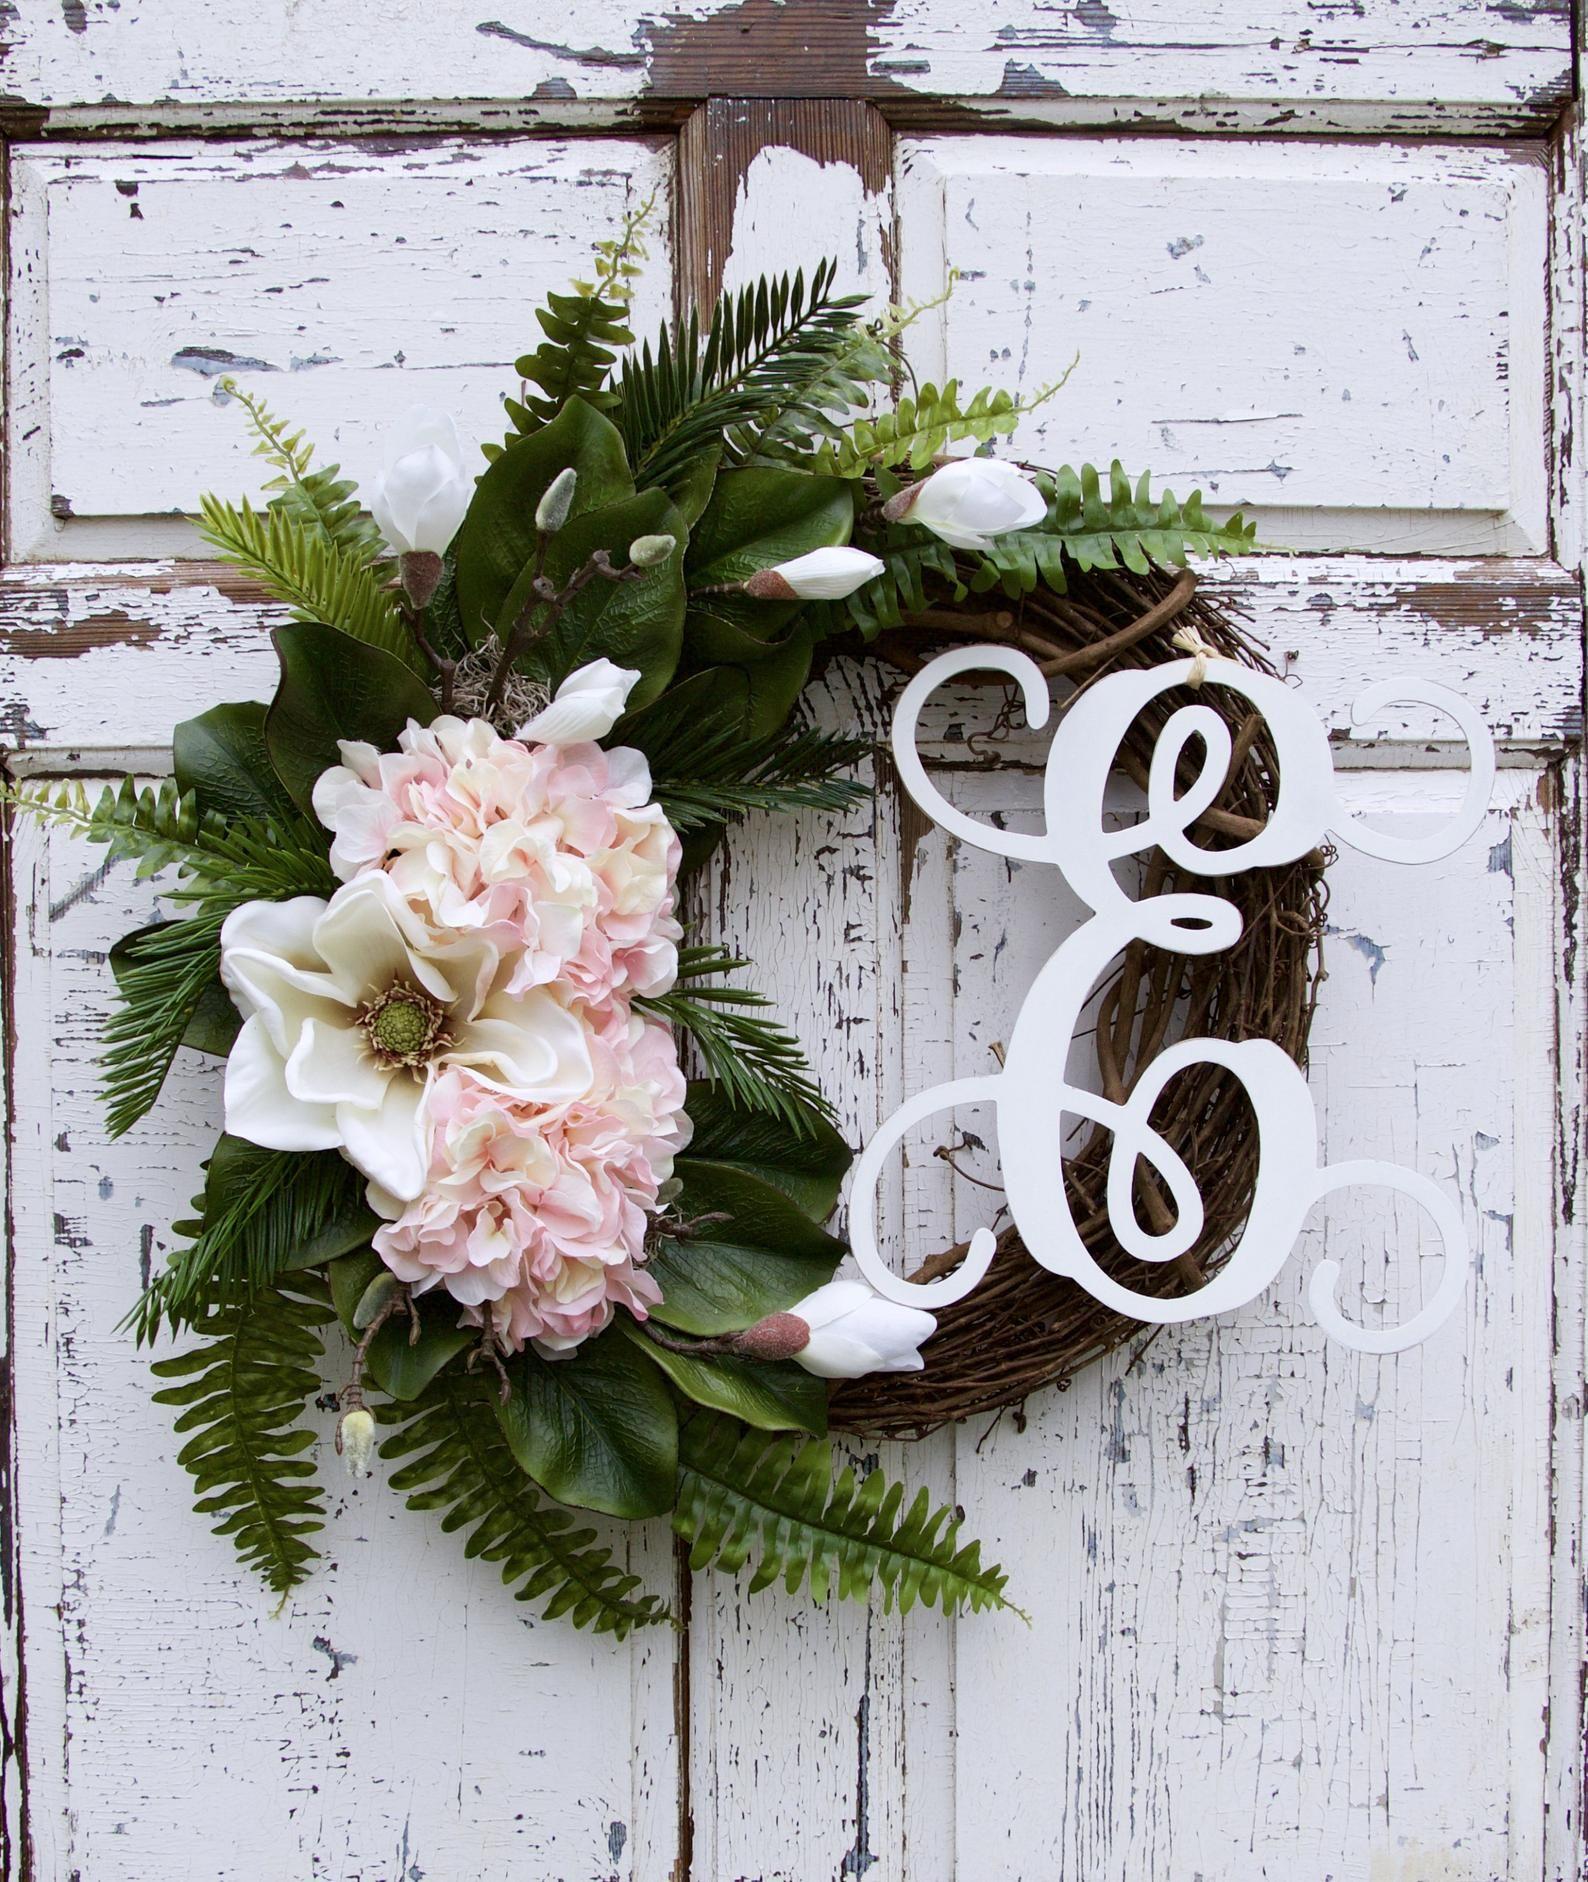 Photo of Monogram Wreath Magnolia Wreath Pink Hydrangea Wreath Last Name Wreath Year Round Wreath Initial Wreath Vine Letter Wreath Front Door Wreath